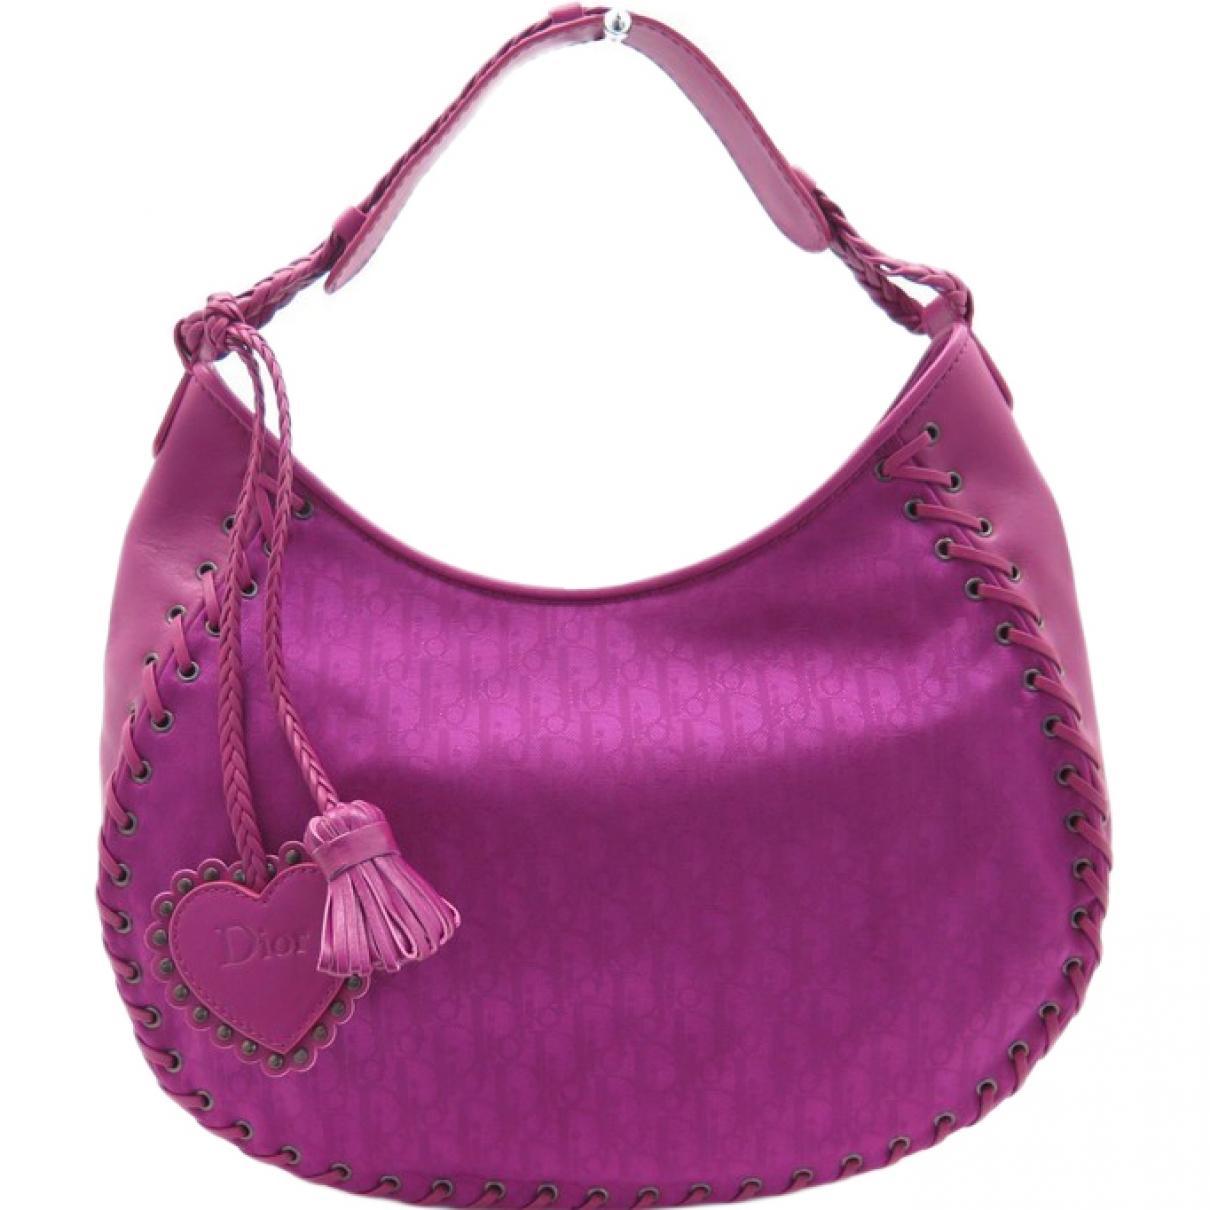 a1b8be0df8 Sac à main en toile Dior en coloris Violet - Lyst